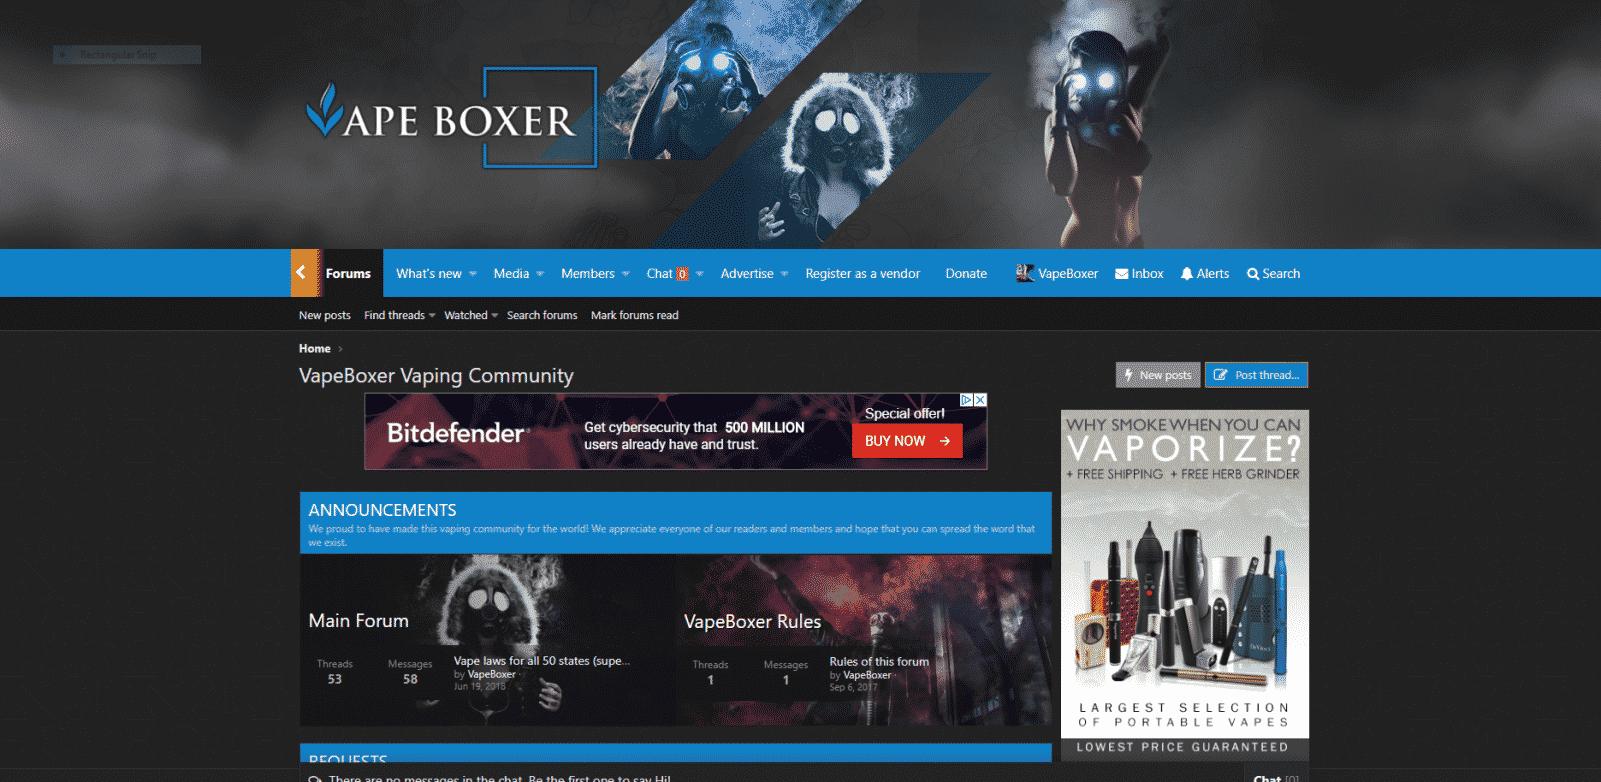 vapeboxer.com